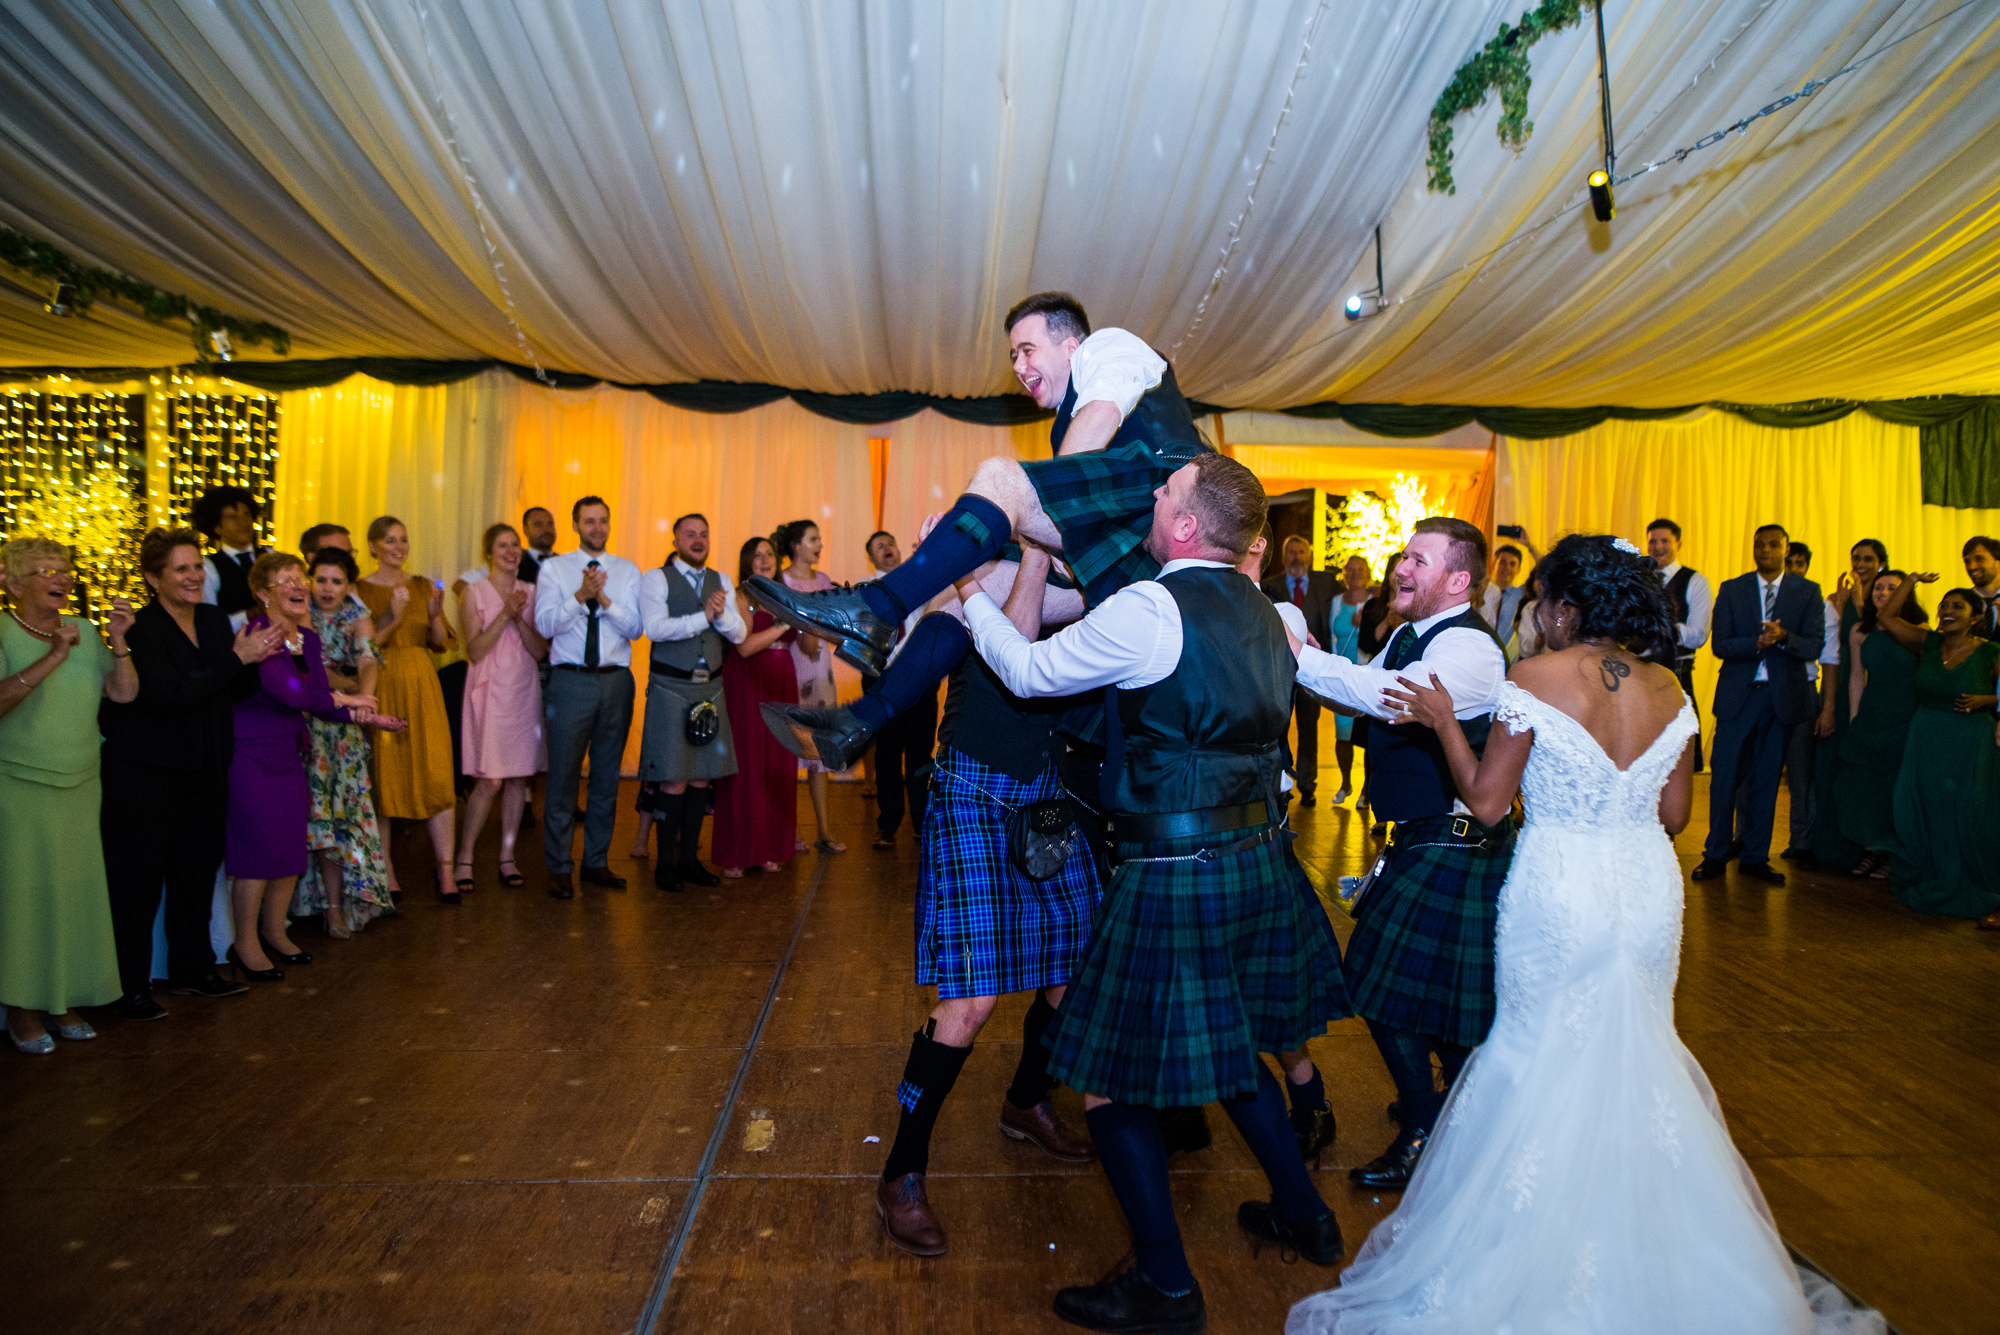 Kev and Shrabani wedding photos (346 of 350).jpg